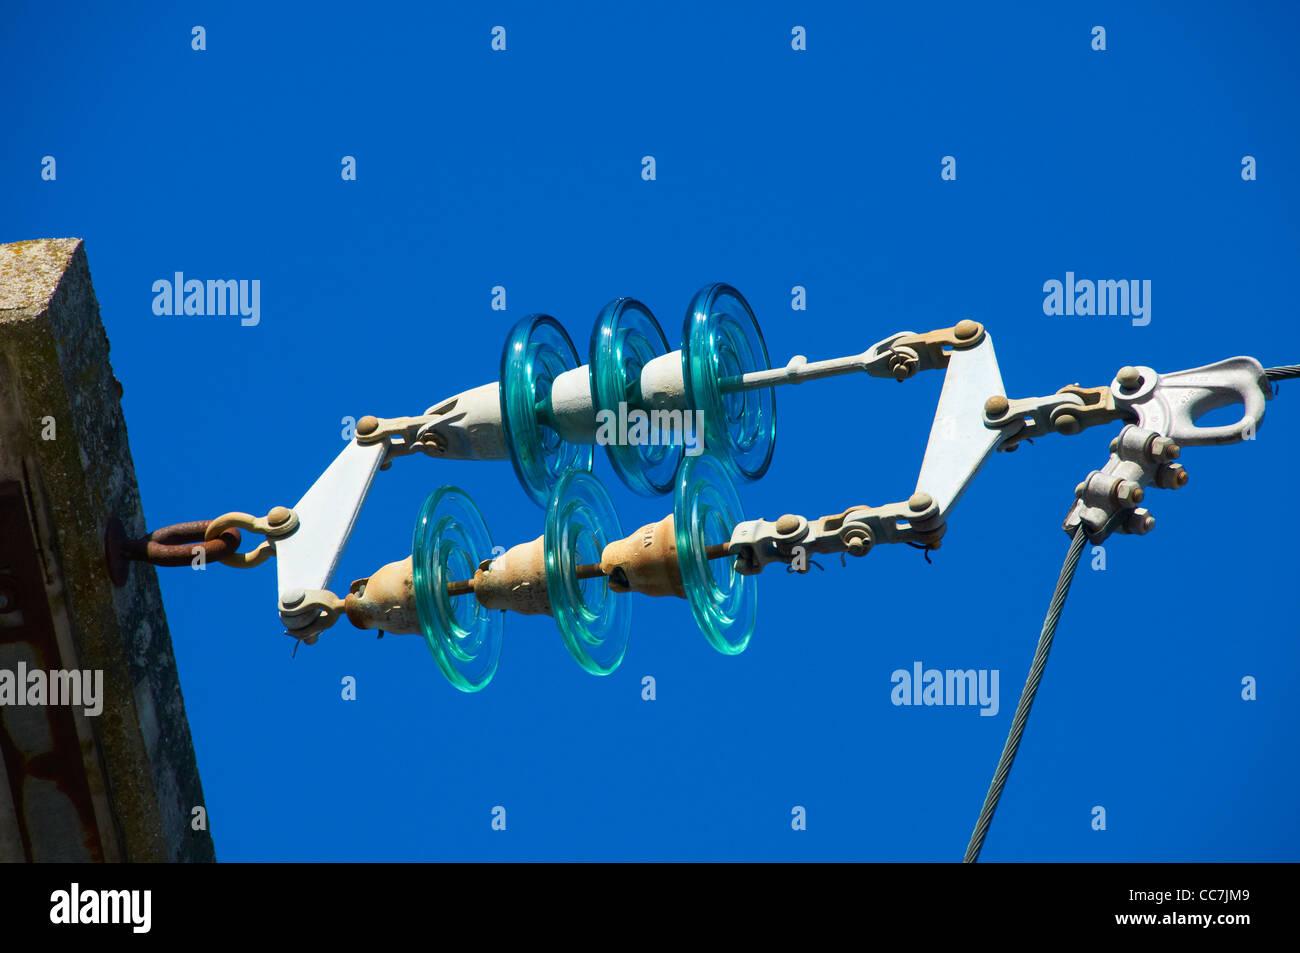 Fantastic Glow Plug Relay Wiring Pontiac Vibe Ignition Wiring-diagram